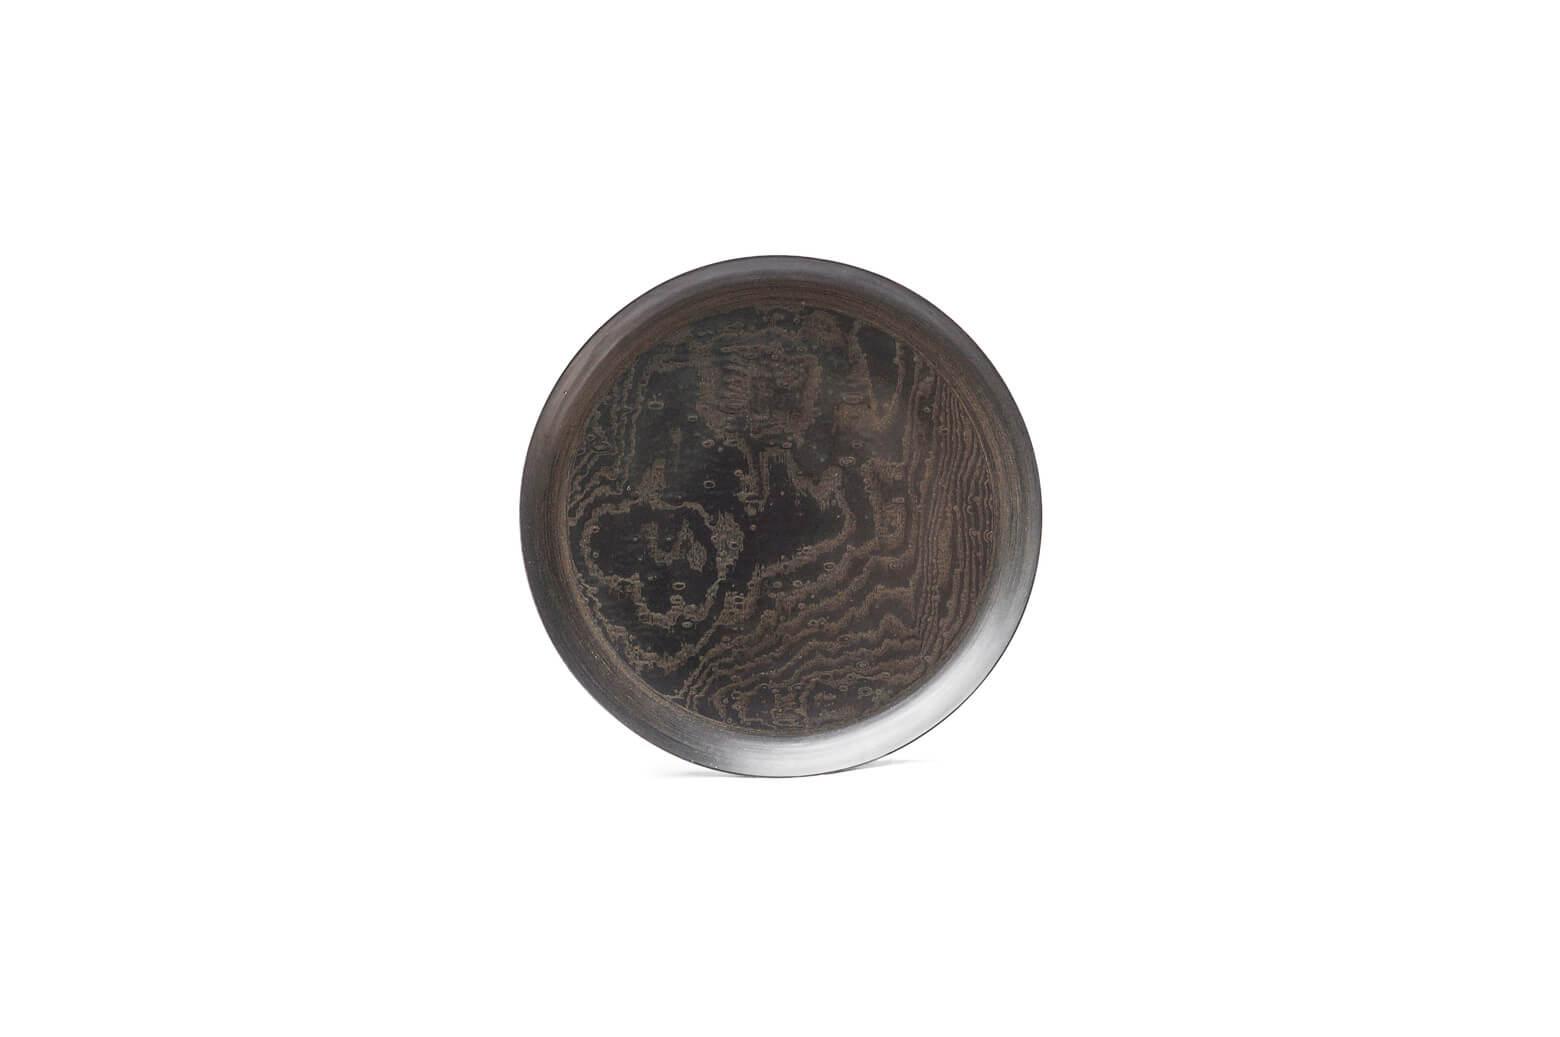 BUNACO Round Tray/ブナコ ラウンドトレイ 丸盆 日本製 モダンデザイン インテリア雑貨